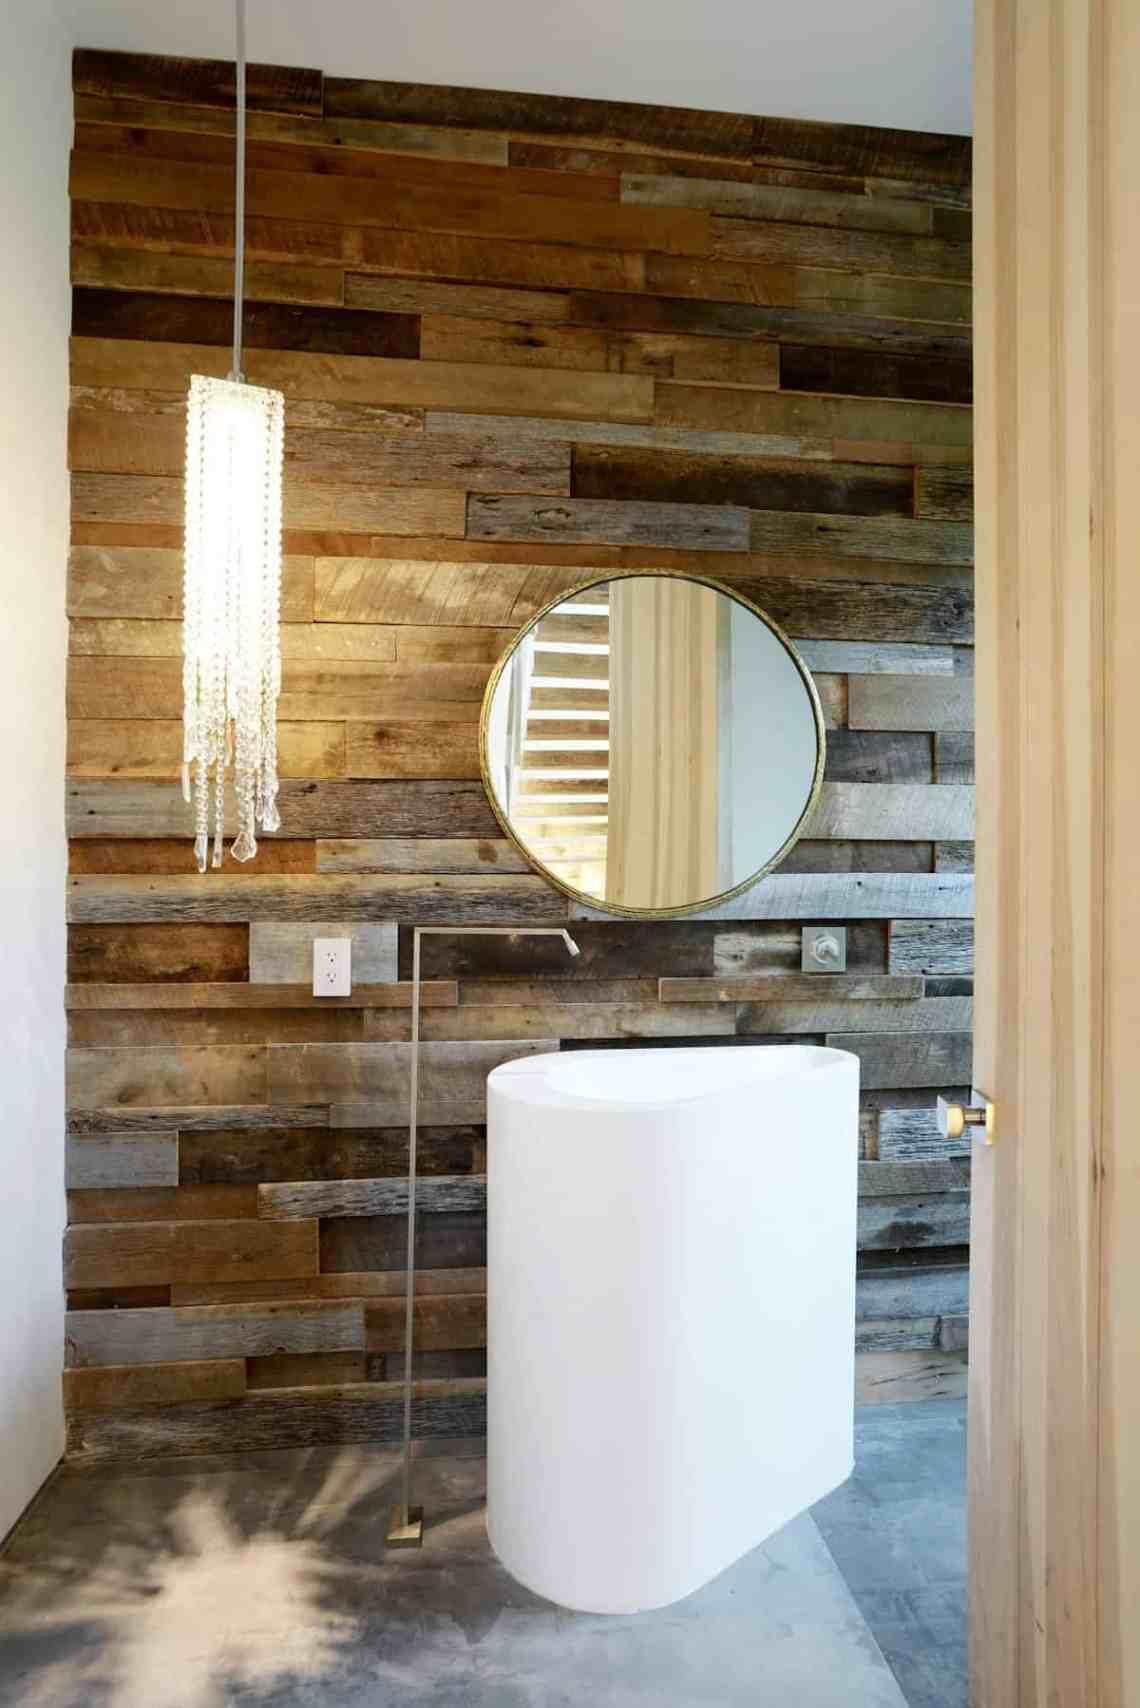 10 Modern Small Bathroom Ideas for Dramatic Design or ...